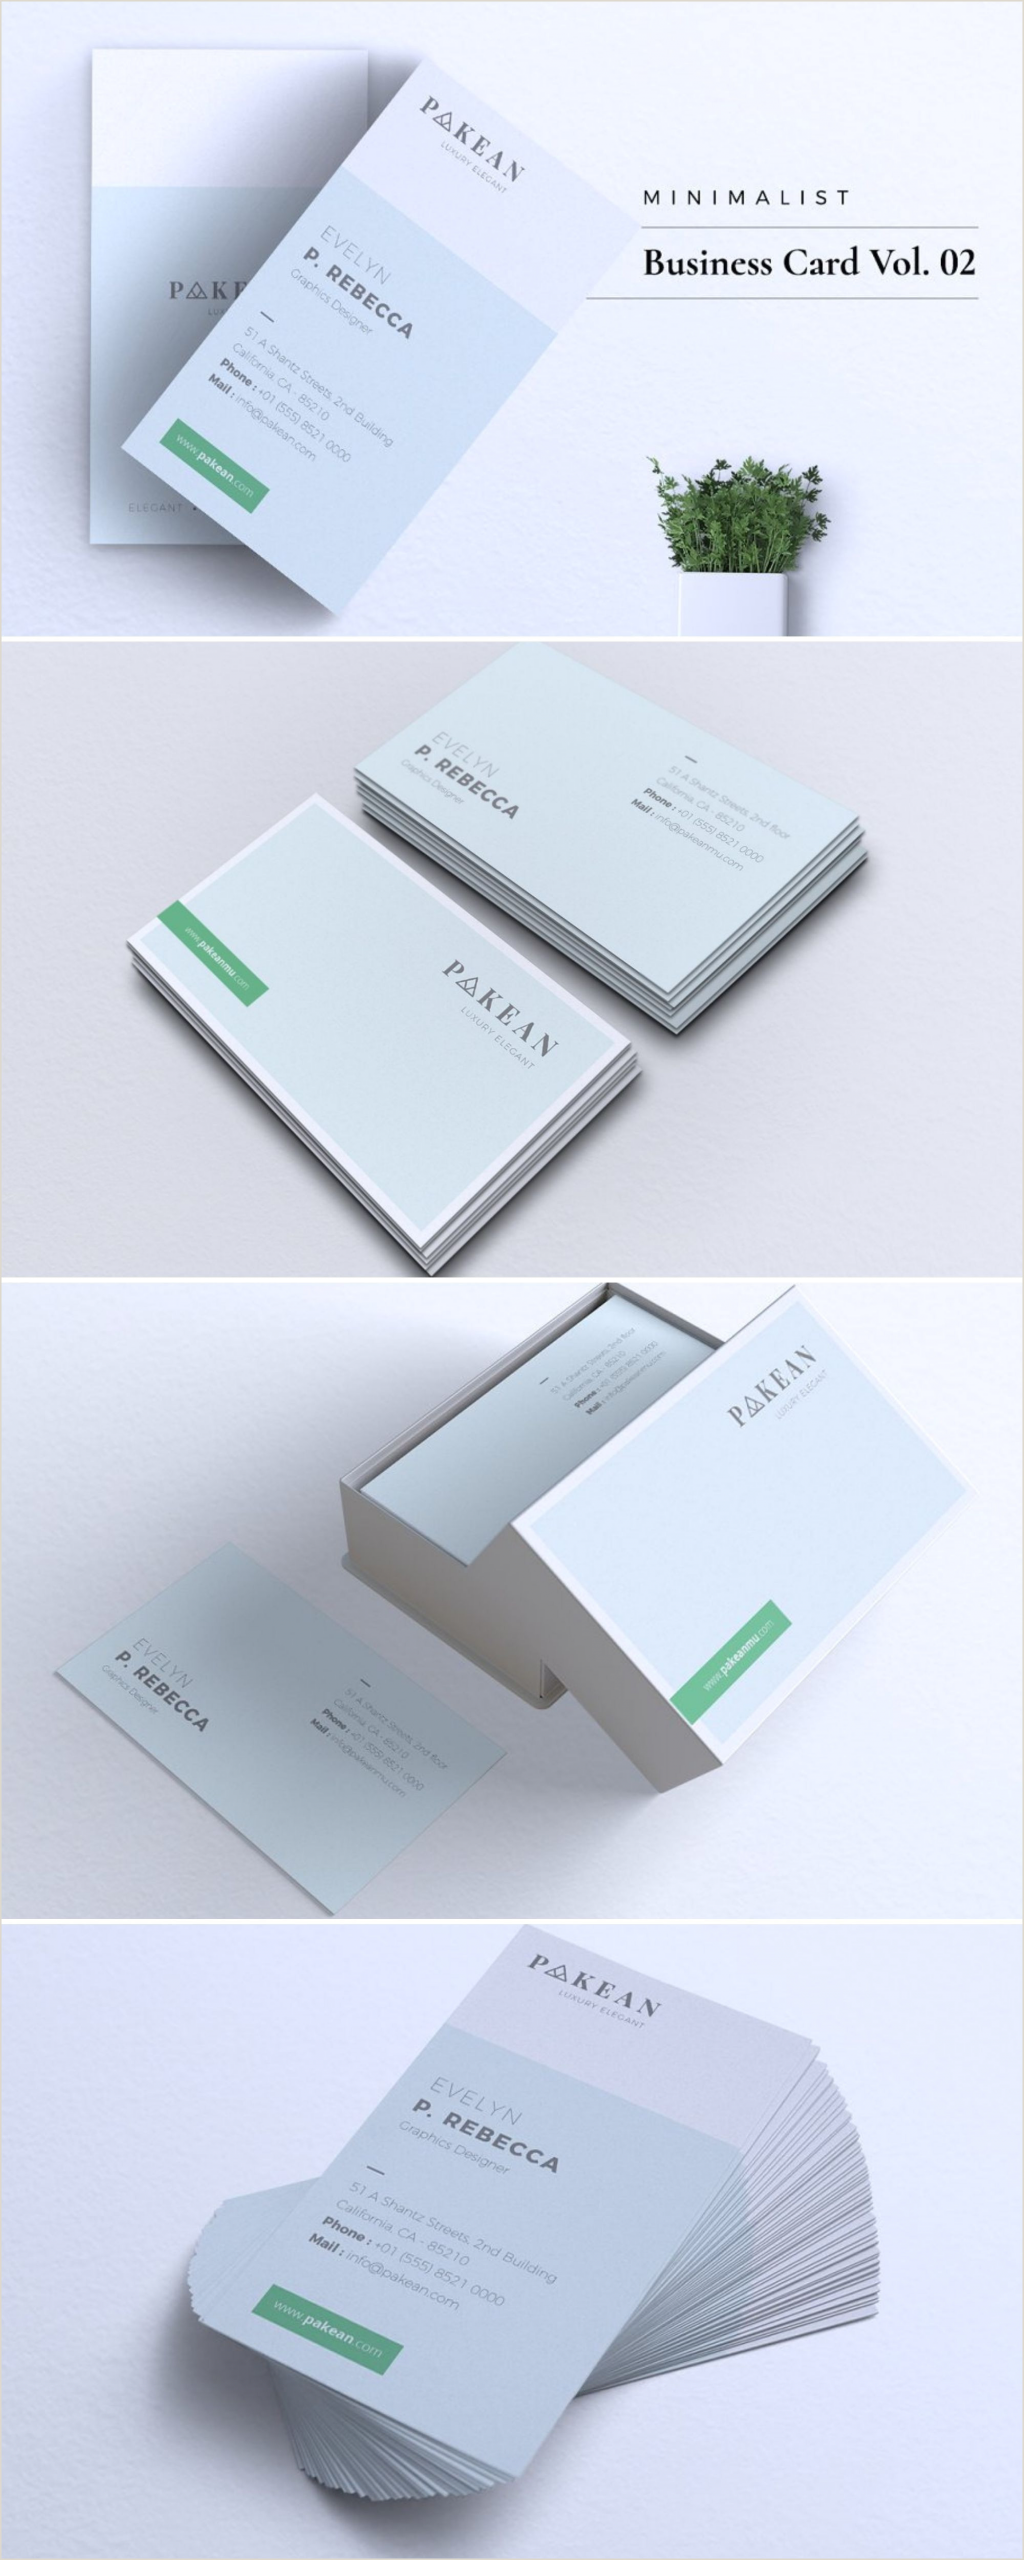 How Big Is A Business Card Minimalist Business Card Vol 02